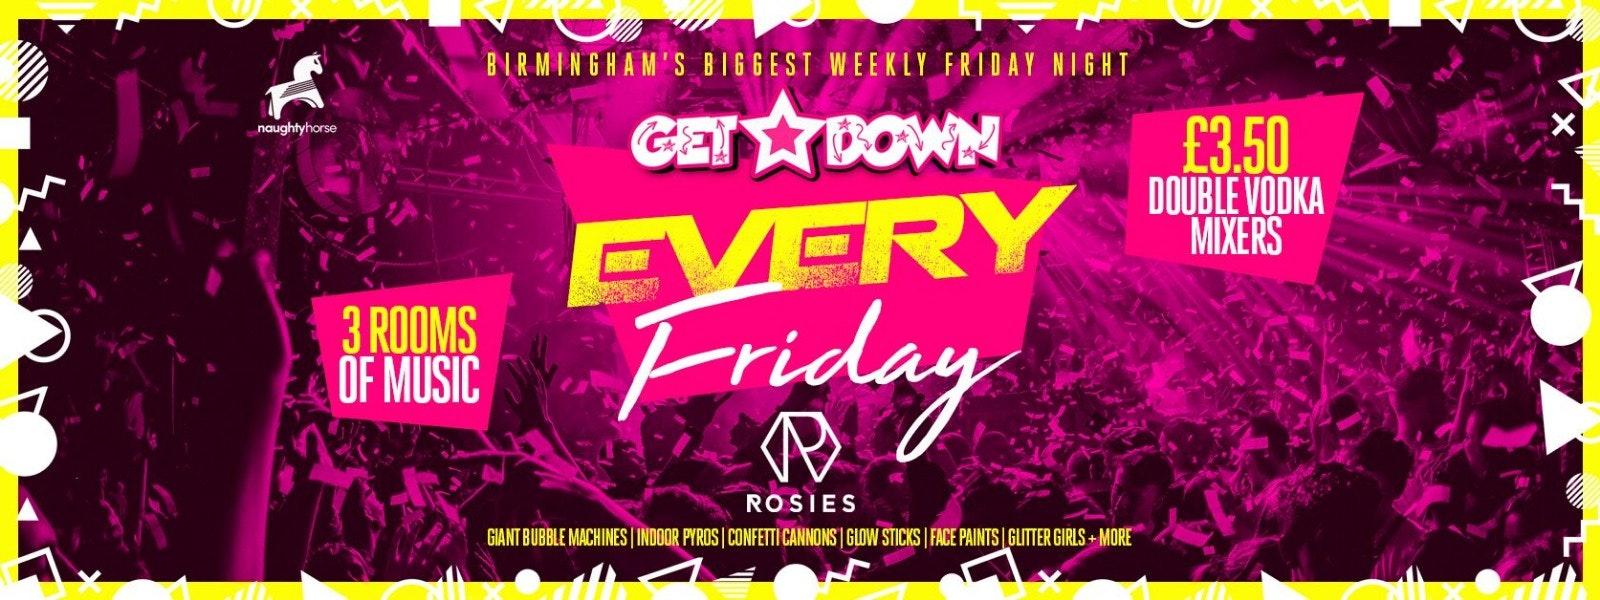 Get Down Fridays – Rosies!